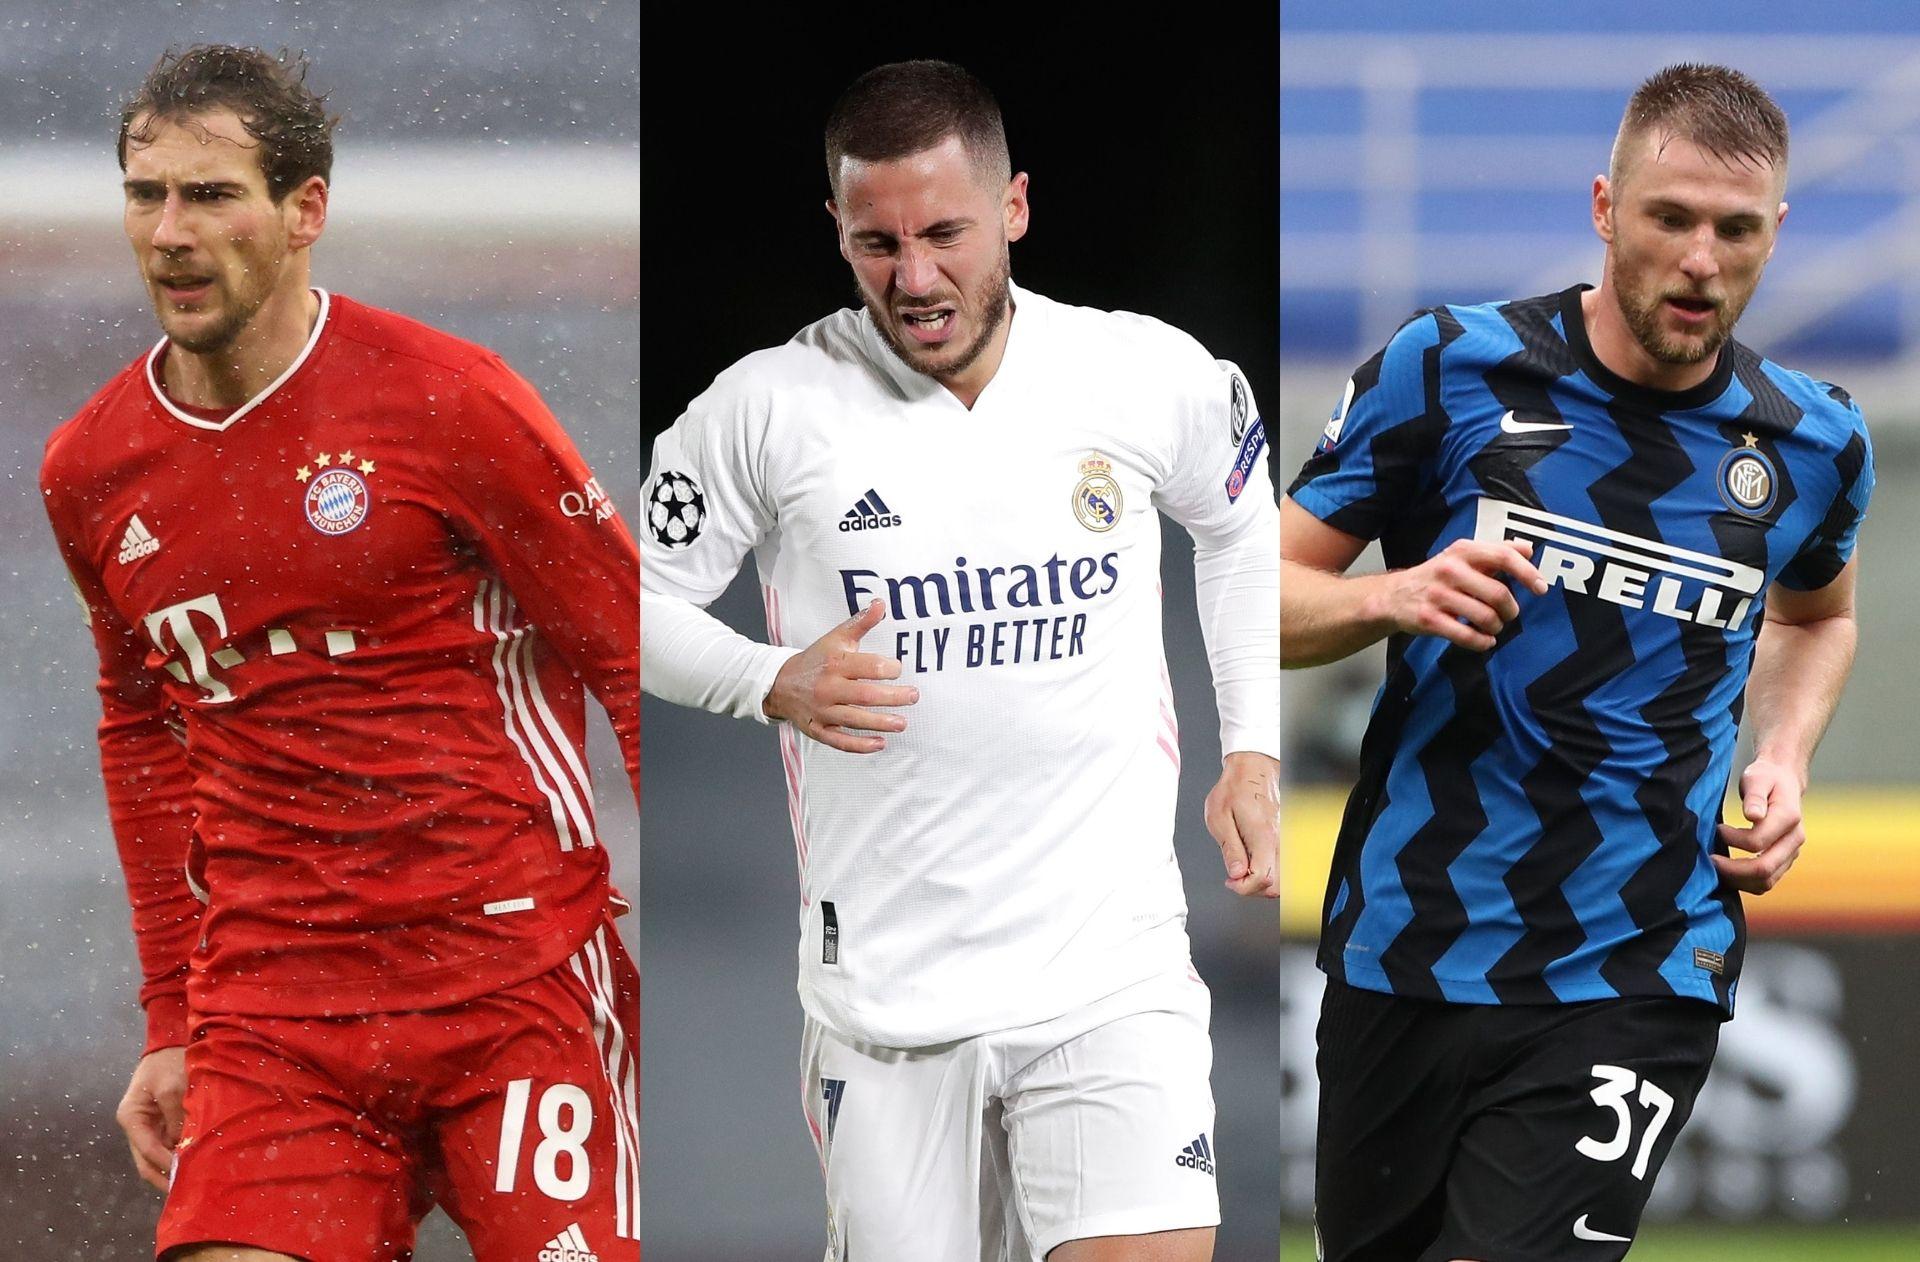 Leon Goretzka of Bayern Munich, Eden Hazard of Real Madrid, Milan Skriniar - Inter Milan